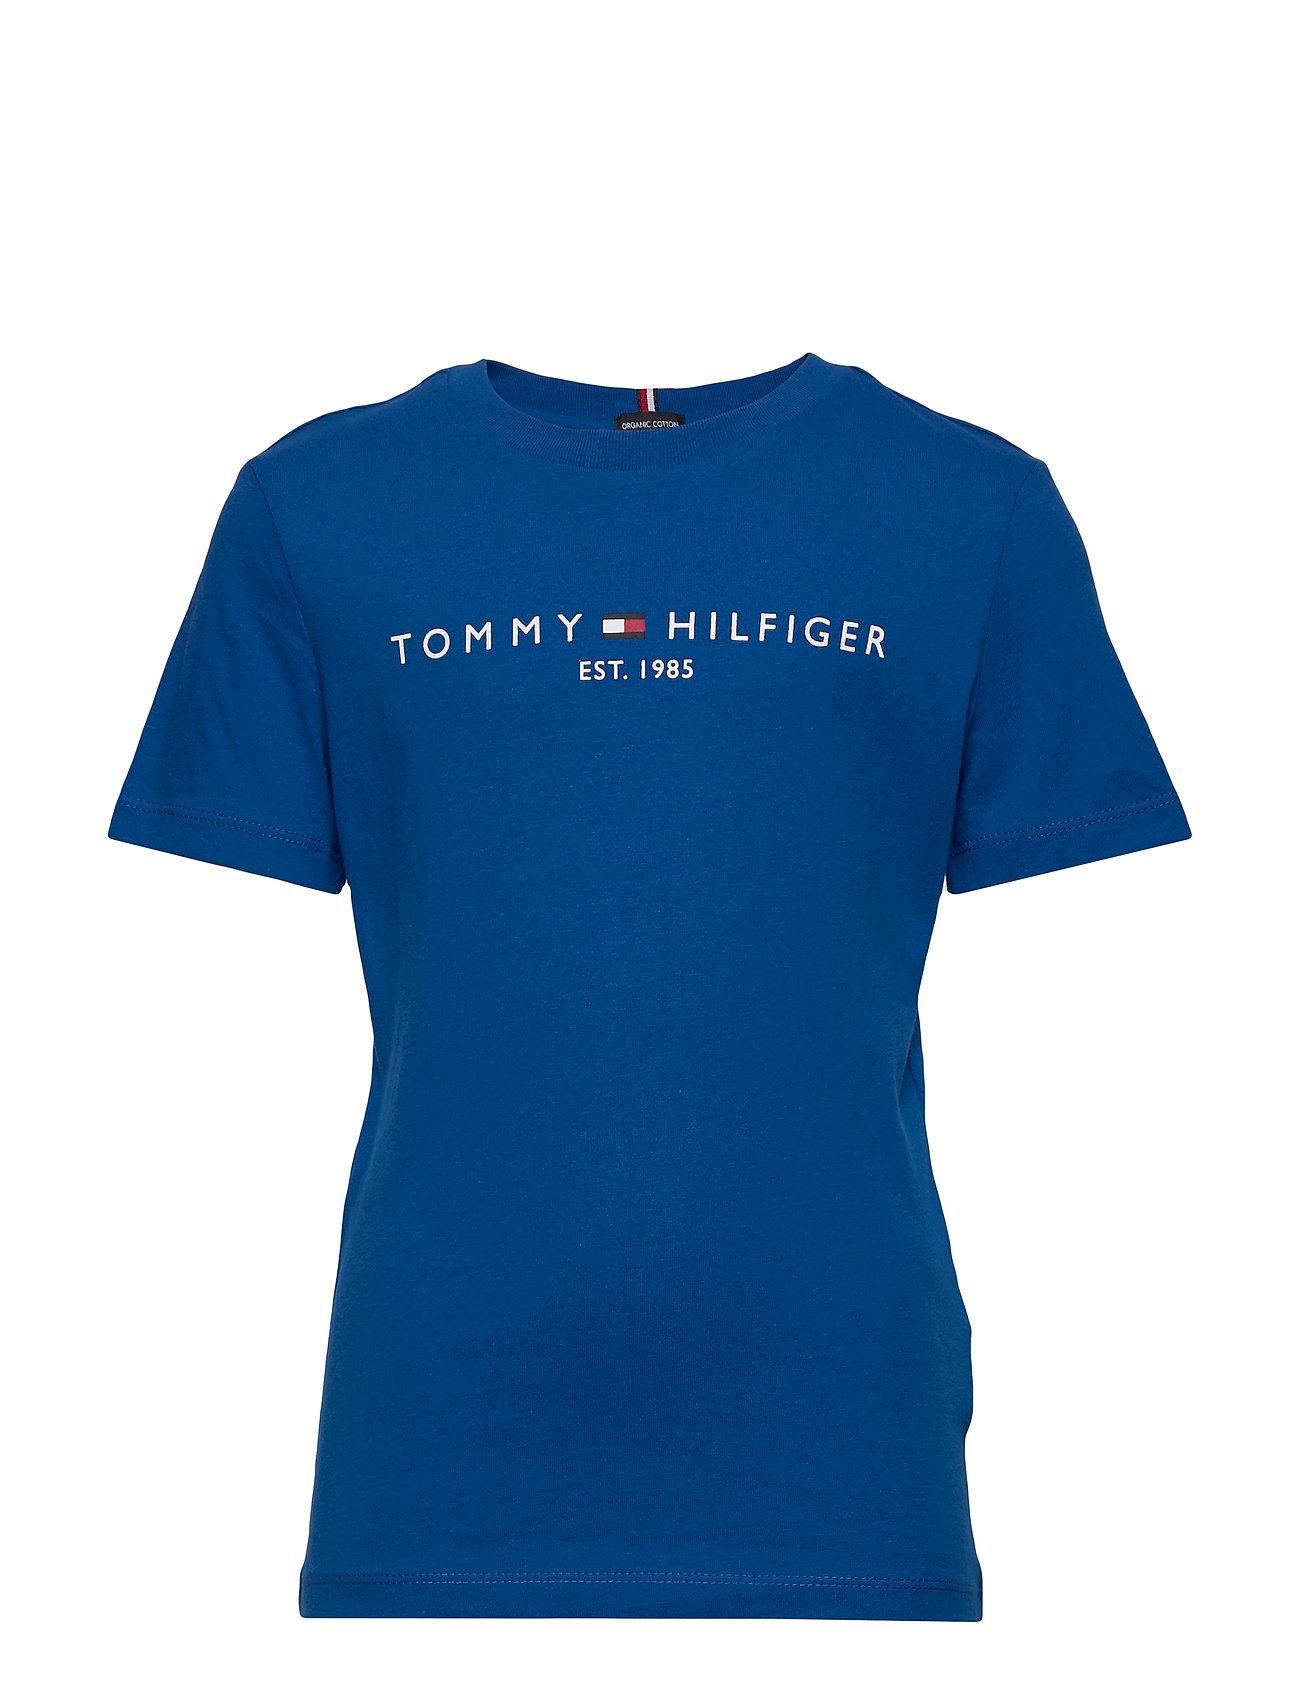 Tommy Hilfiger ESSENTIAL TEE S/S - LAPIS LAZULI 431-880